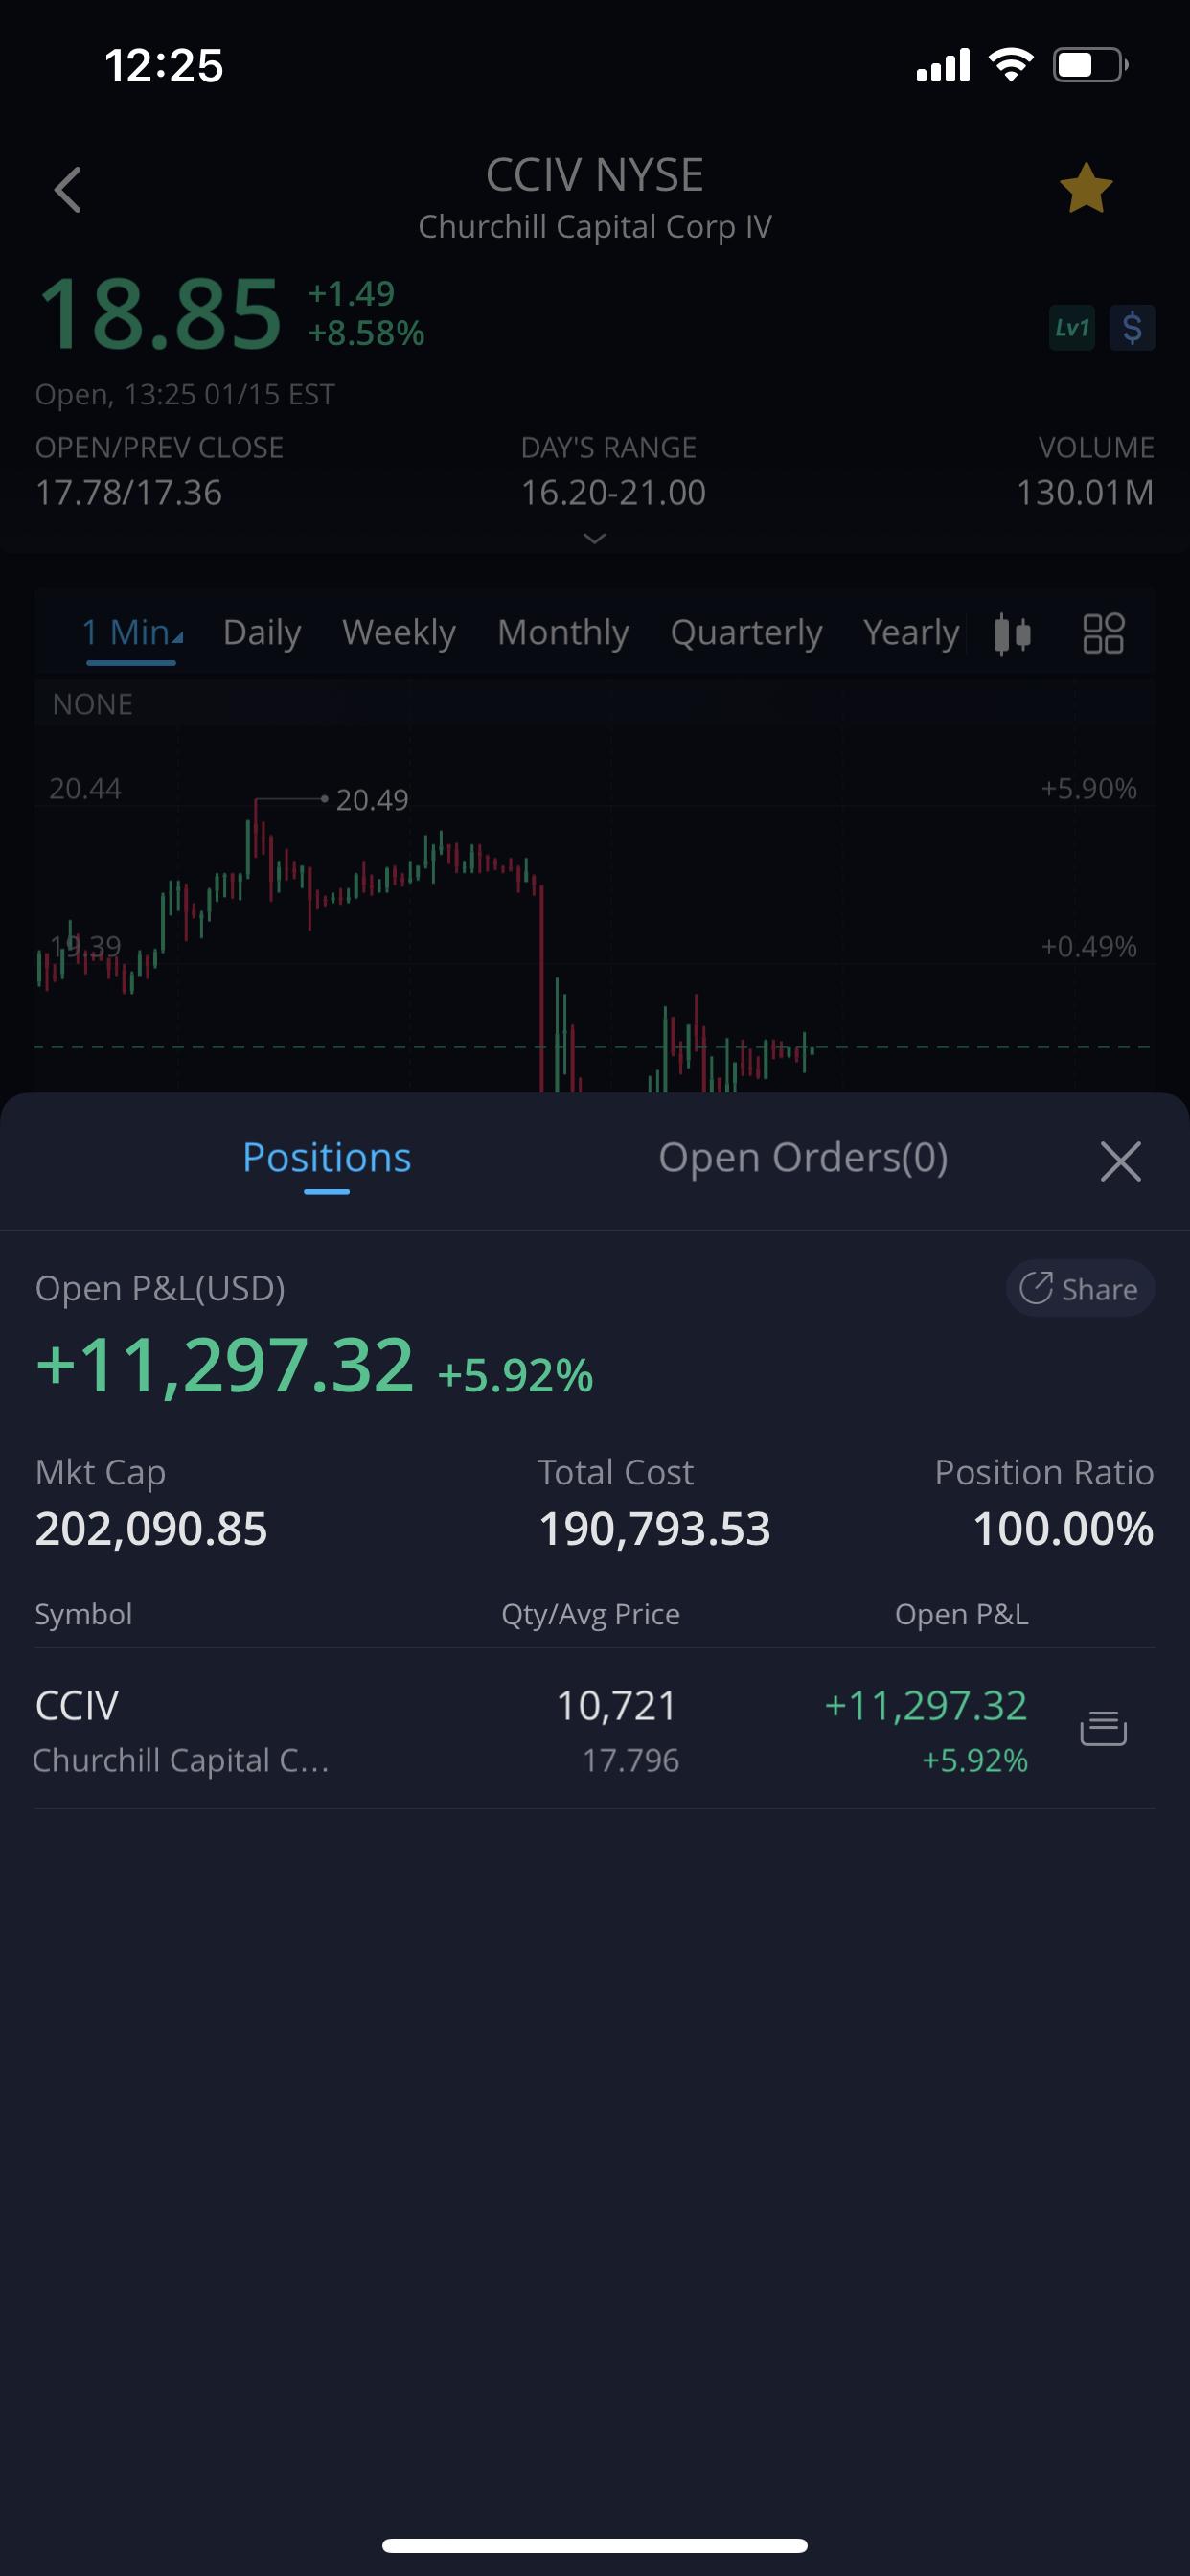 Churchill Capital Corp IV-0